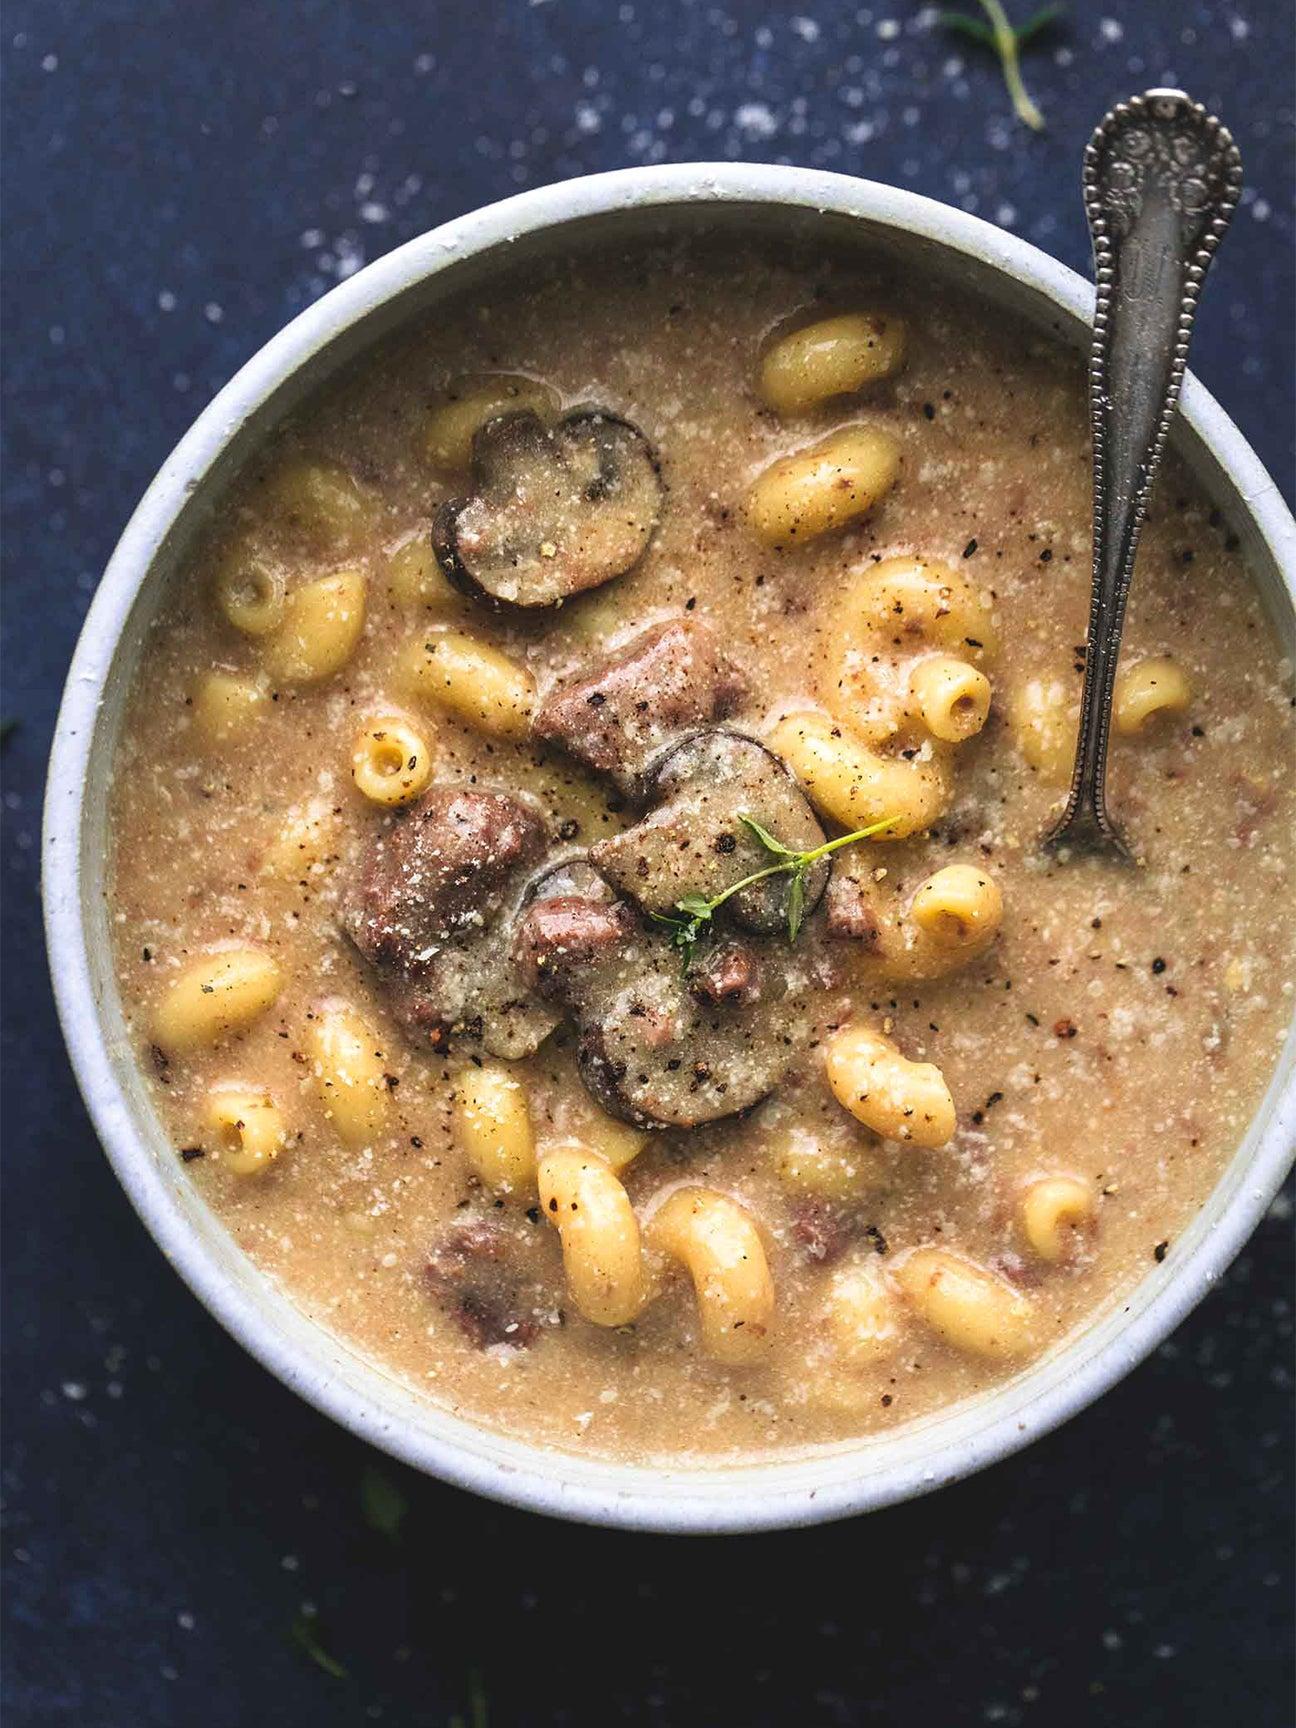 mushroom soup with big noodles